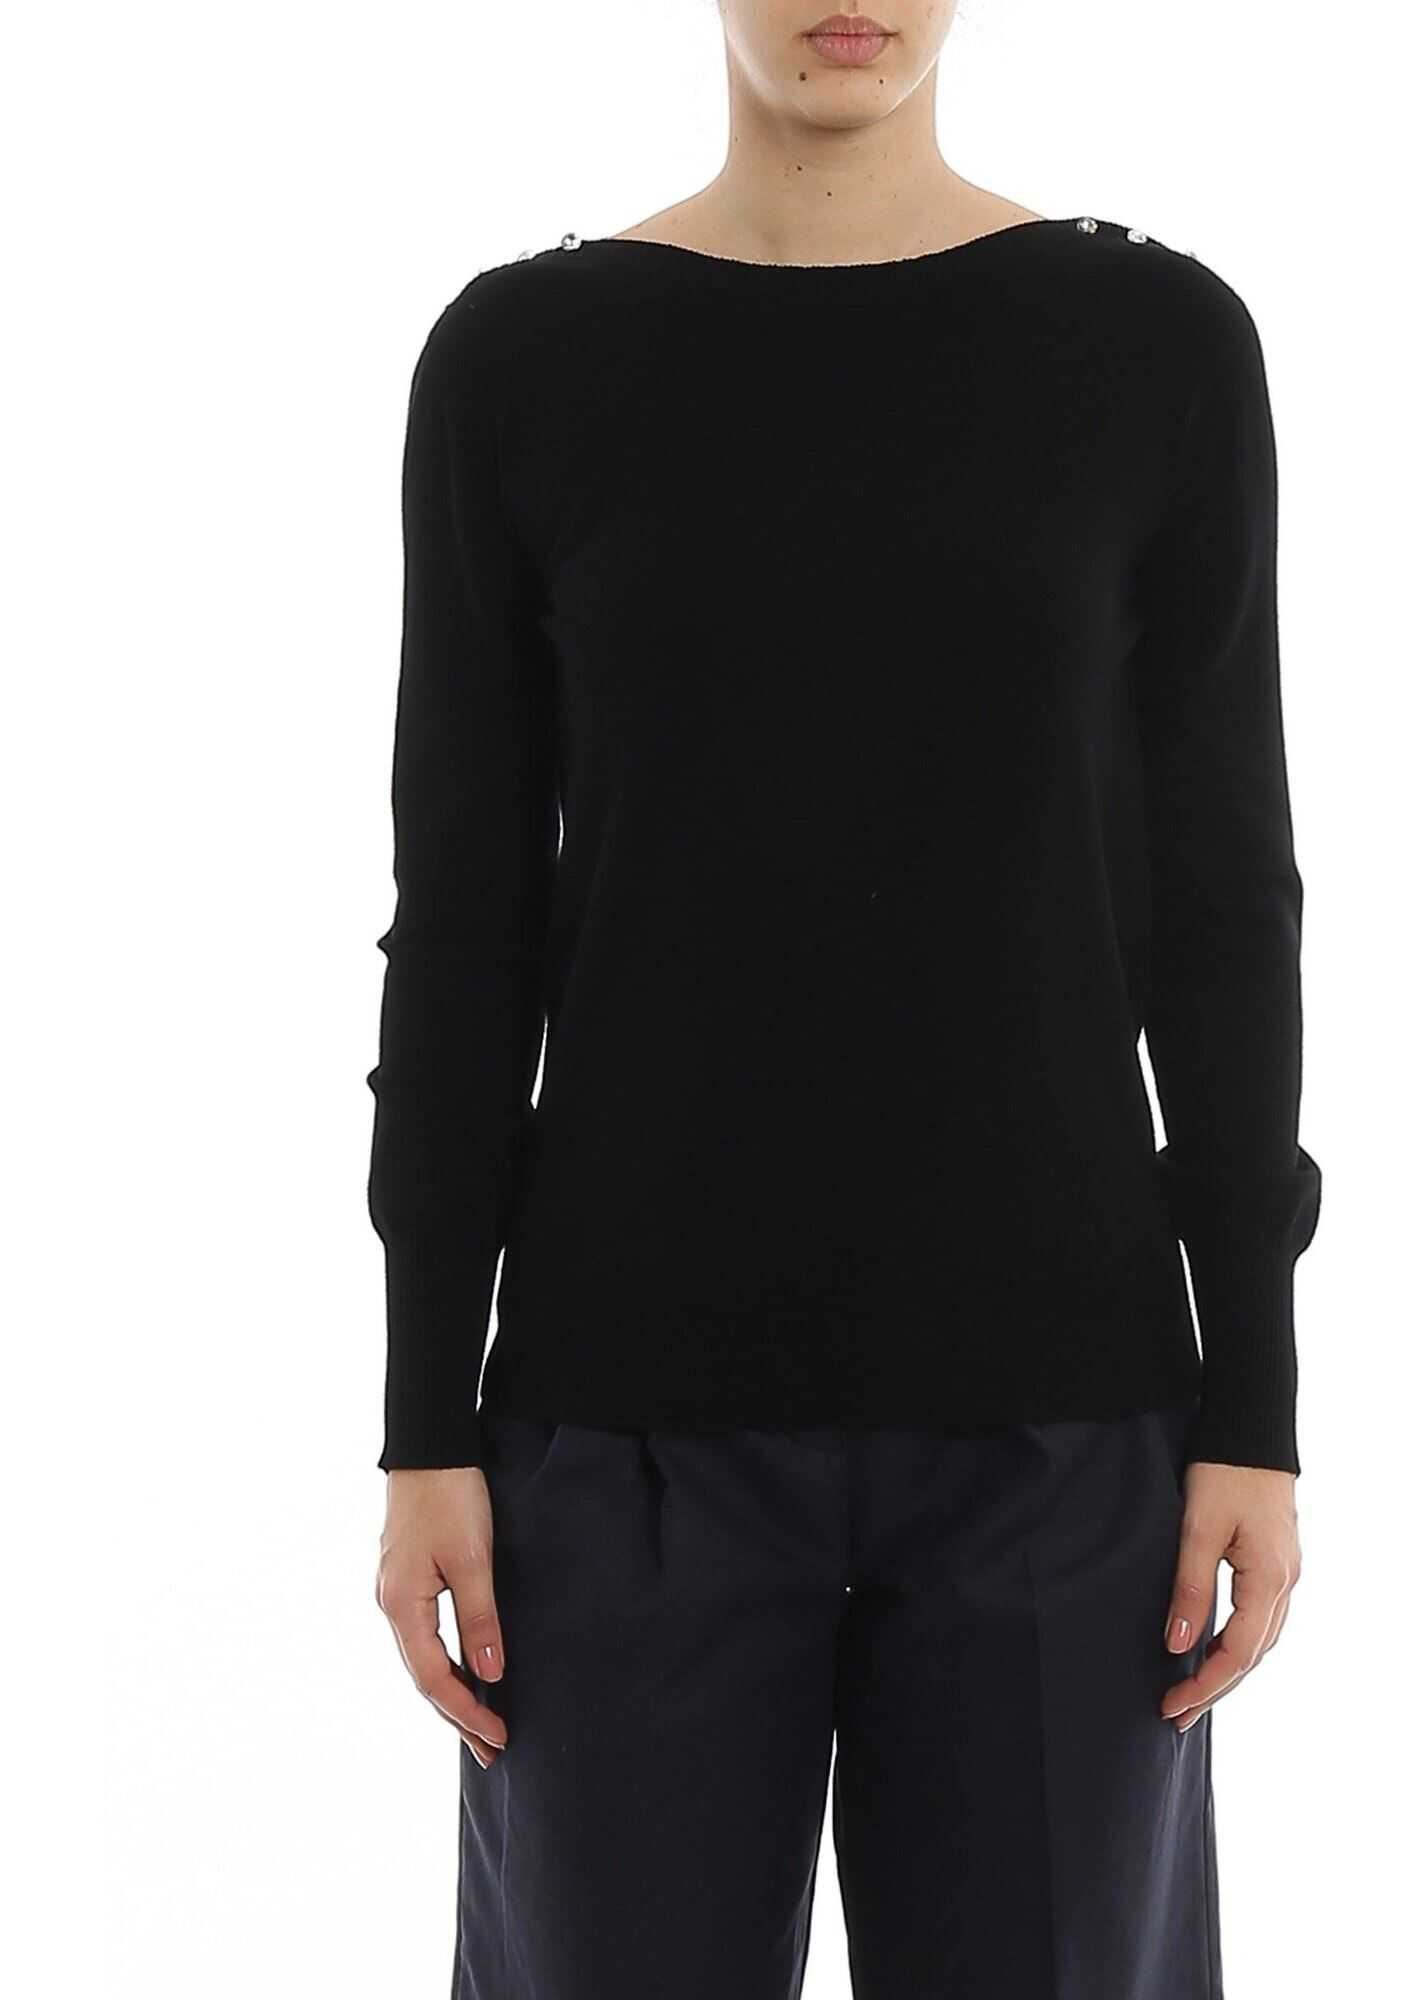 Twin-set Simona Barbieri Rhinestones Button Sweater In Black Black